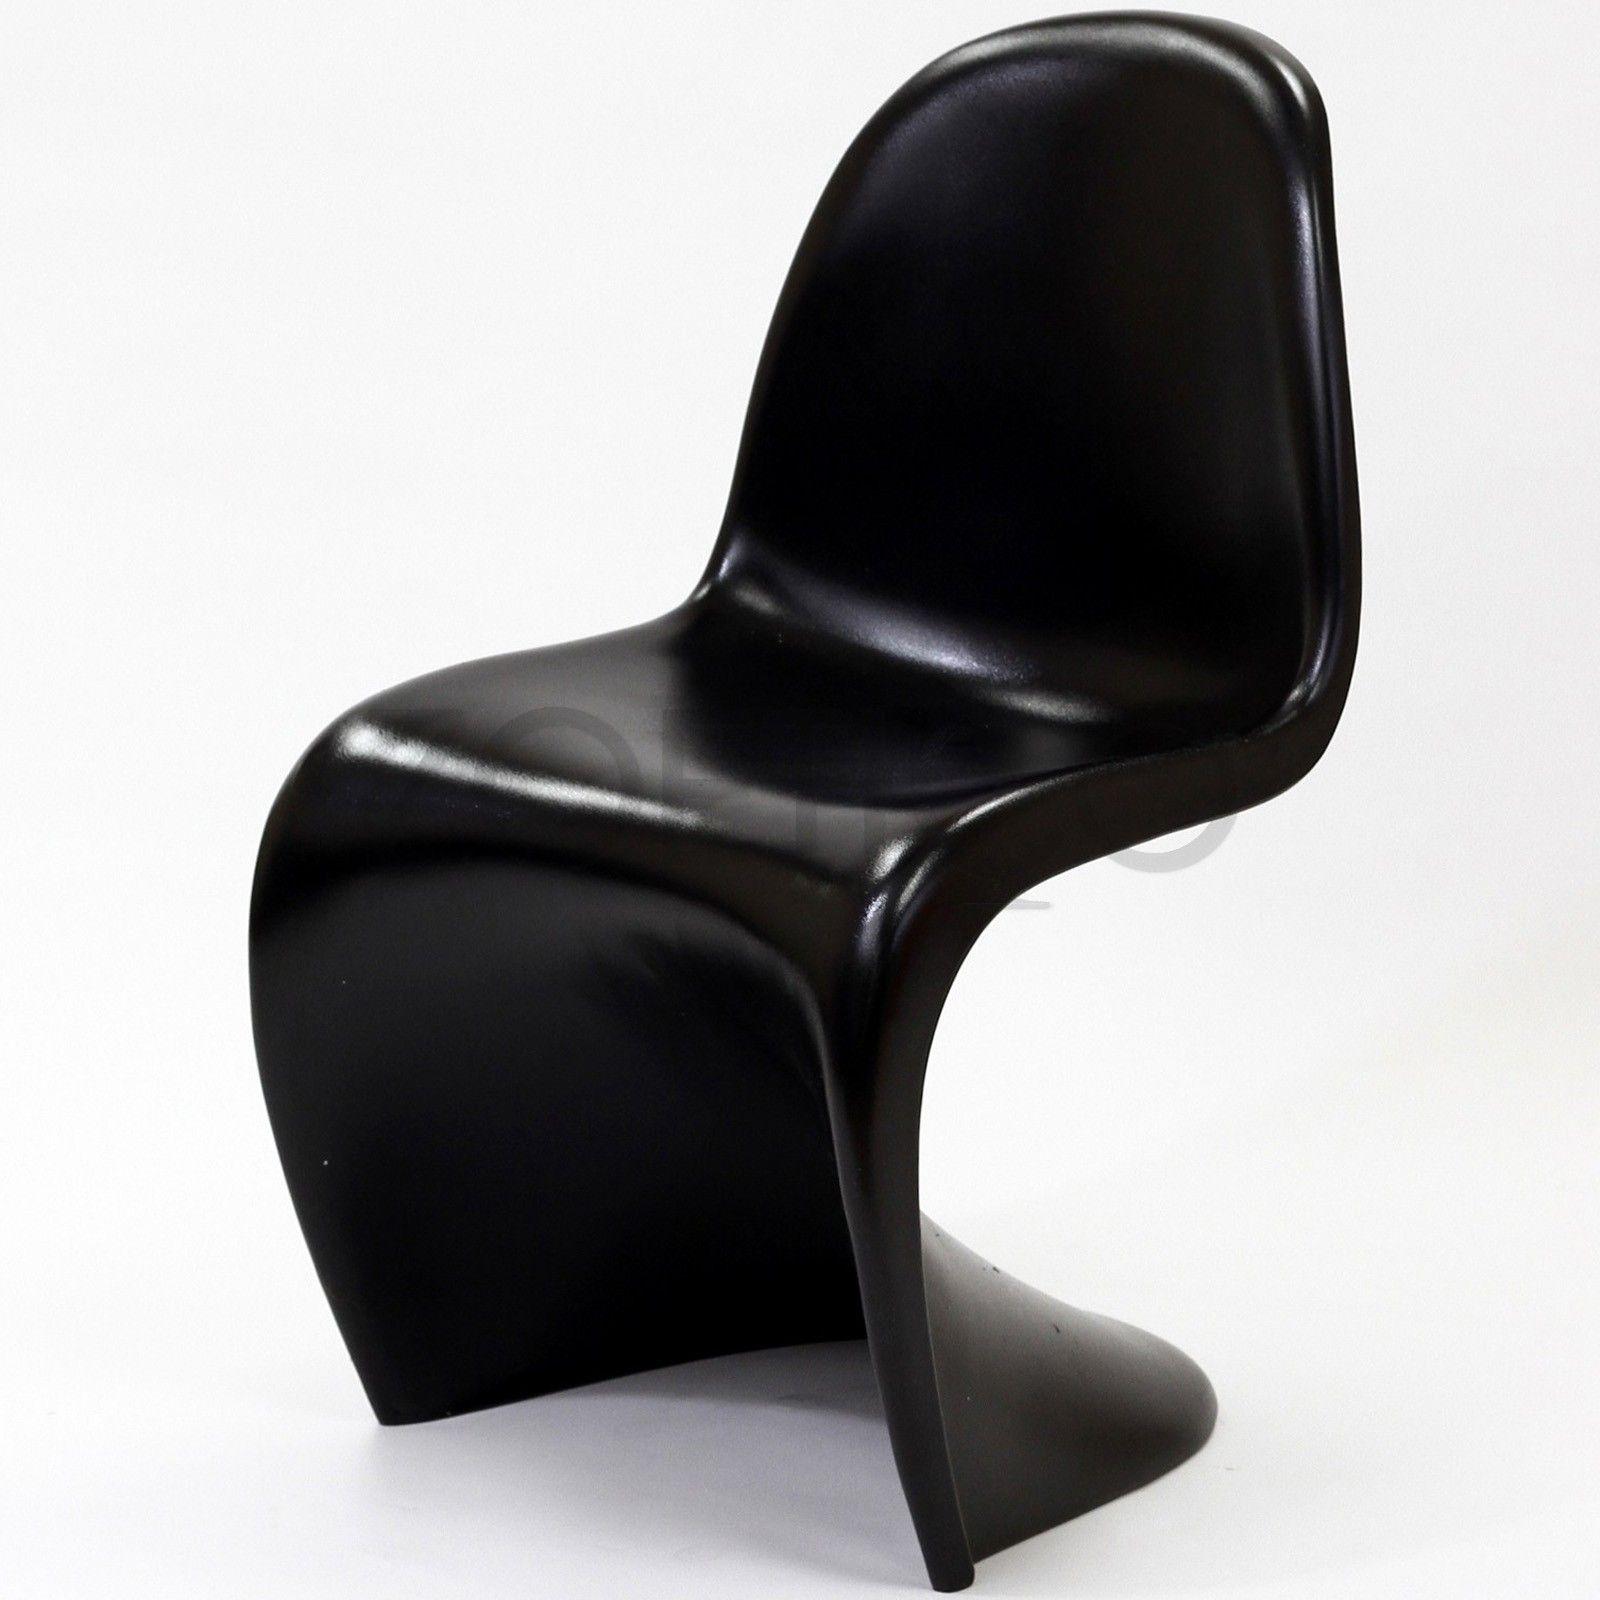 s chair verner panton chairs pinterest. Black Bedroom Furniture Sets. Home Design Ideas